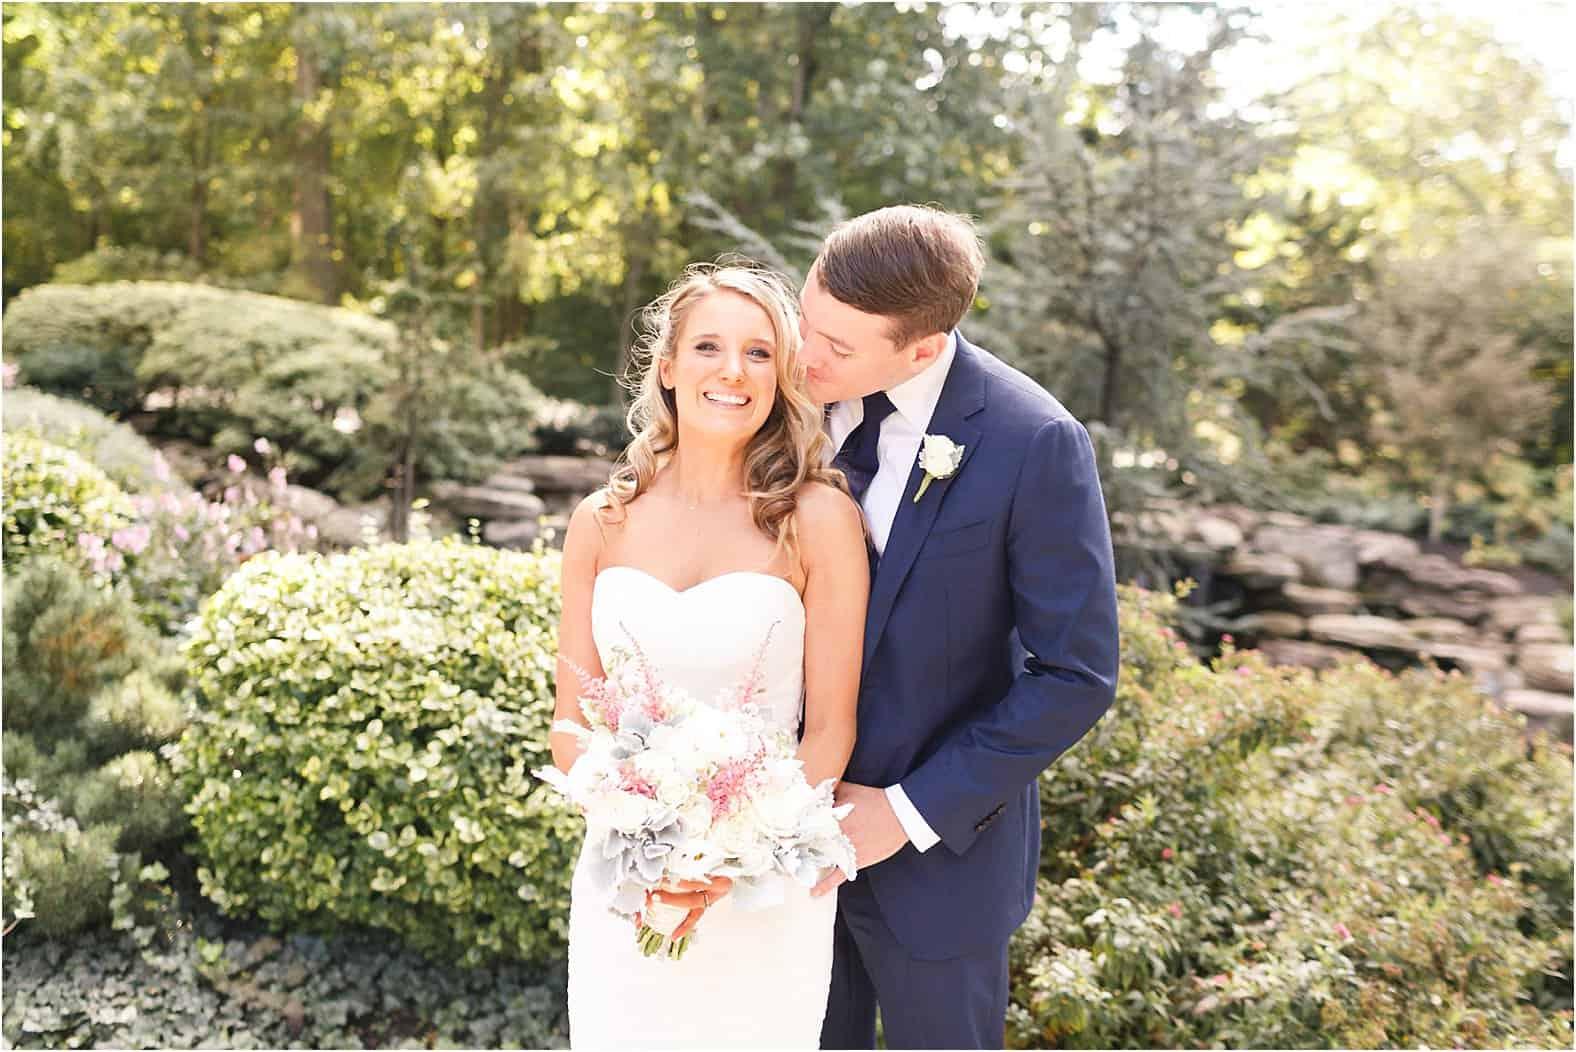 2941 restaurant wedding and events fairfax virginia wedding photos